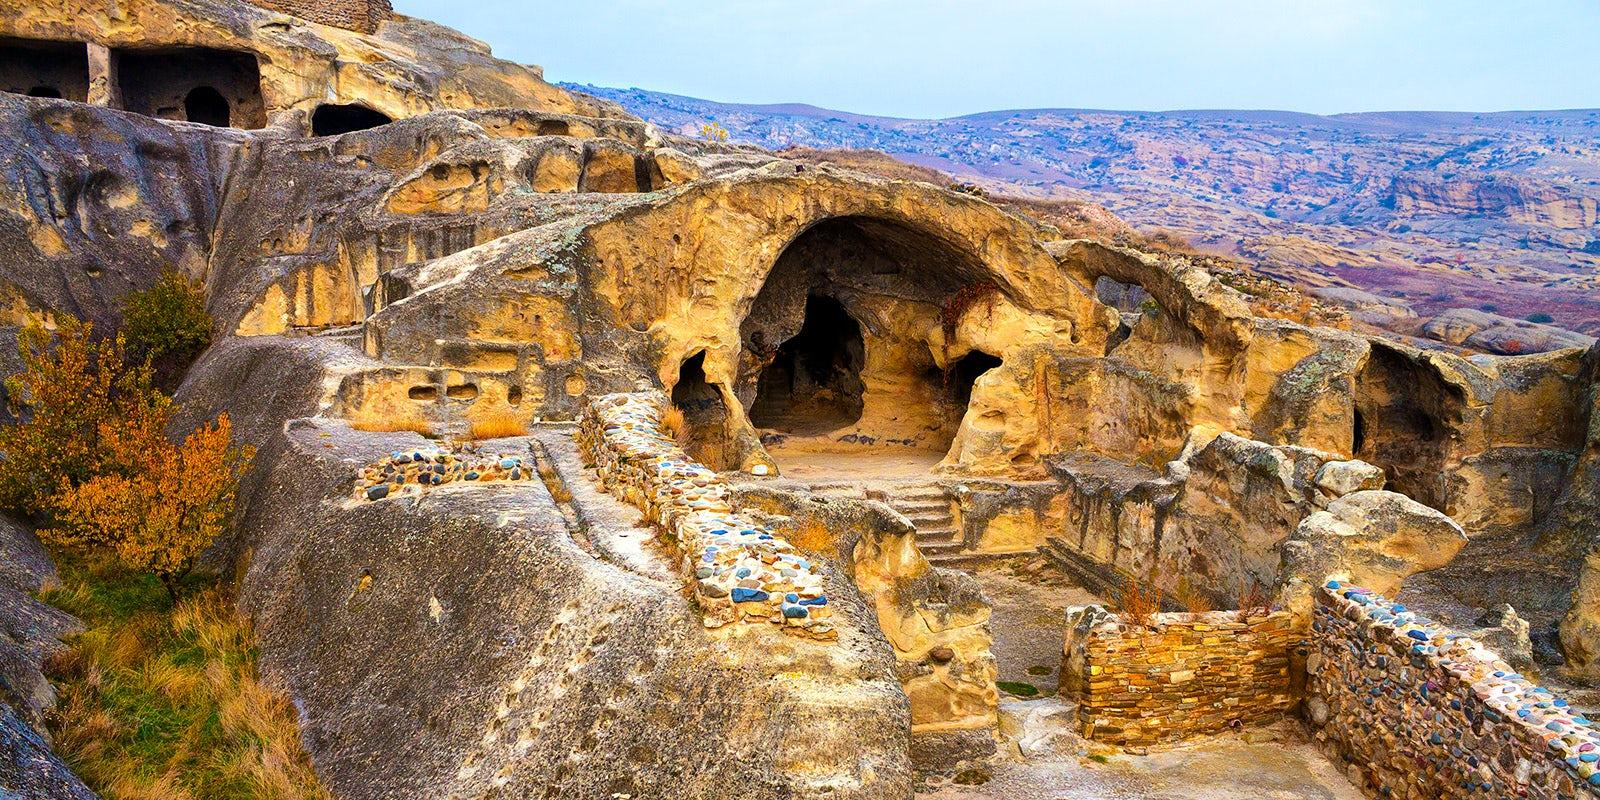 Uplistsikhe, la ciudad troglodita más antigua